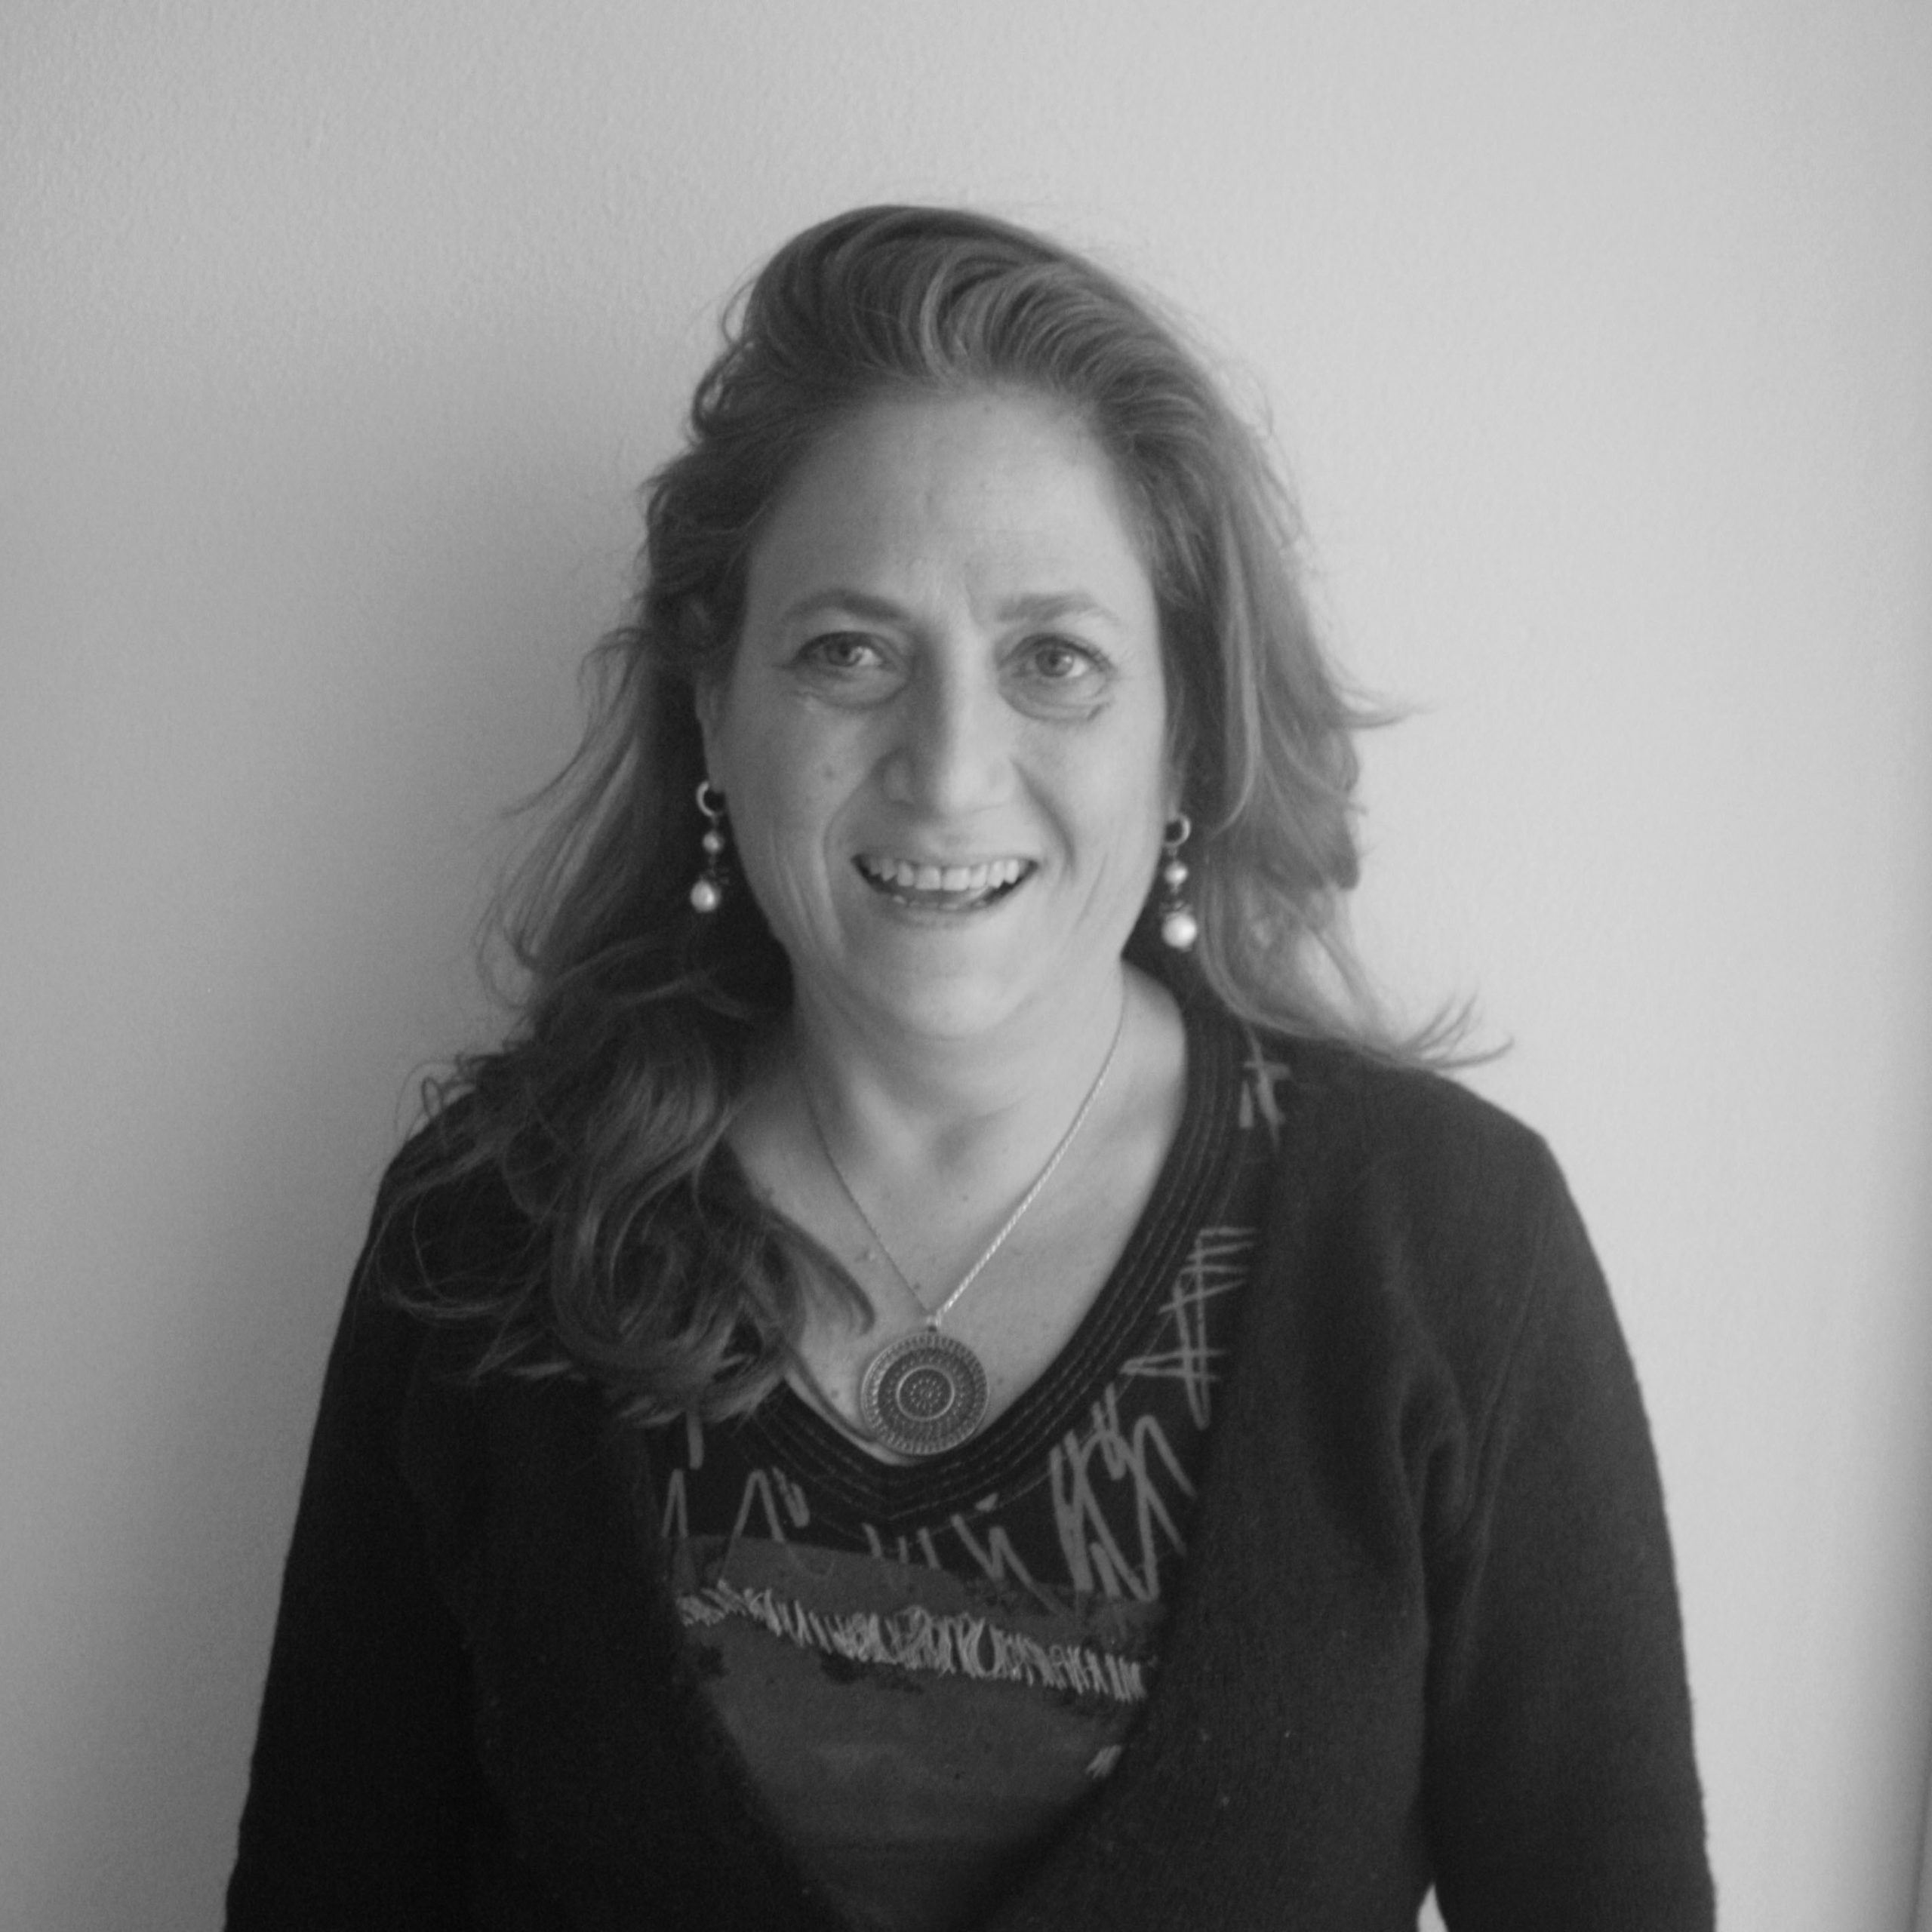 Marzia Zingarelli